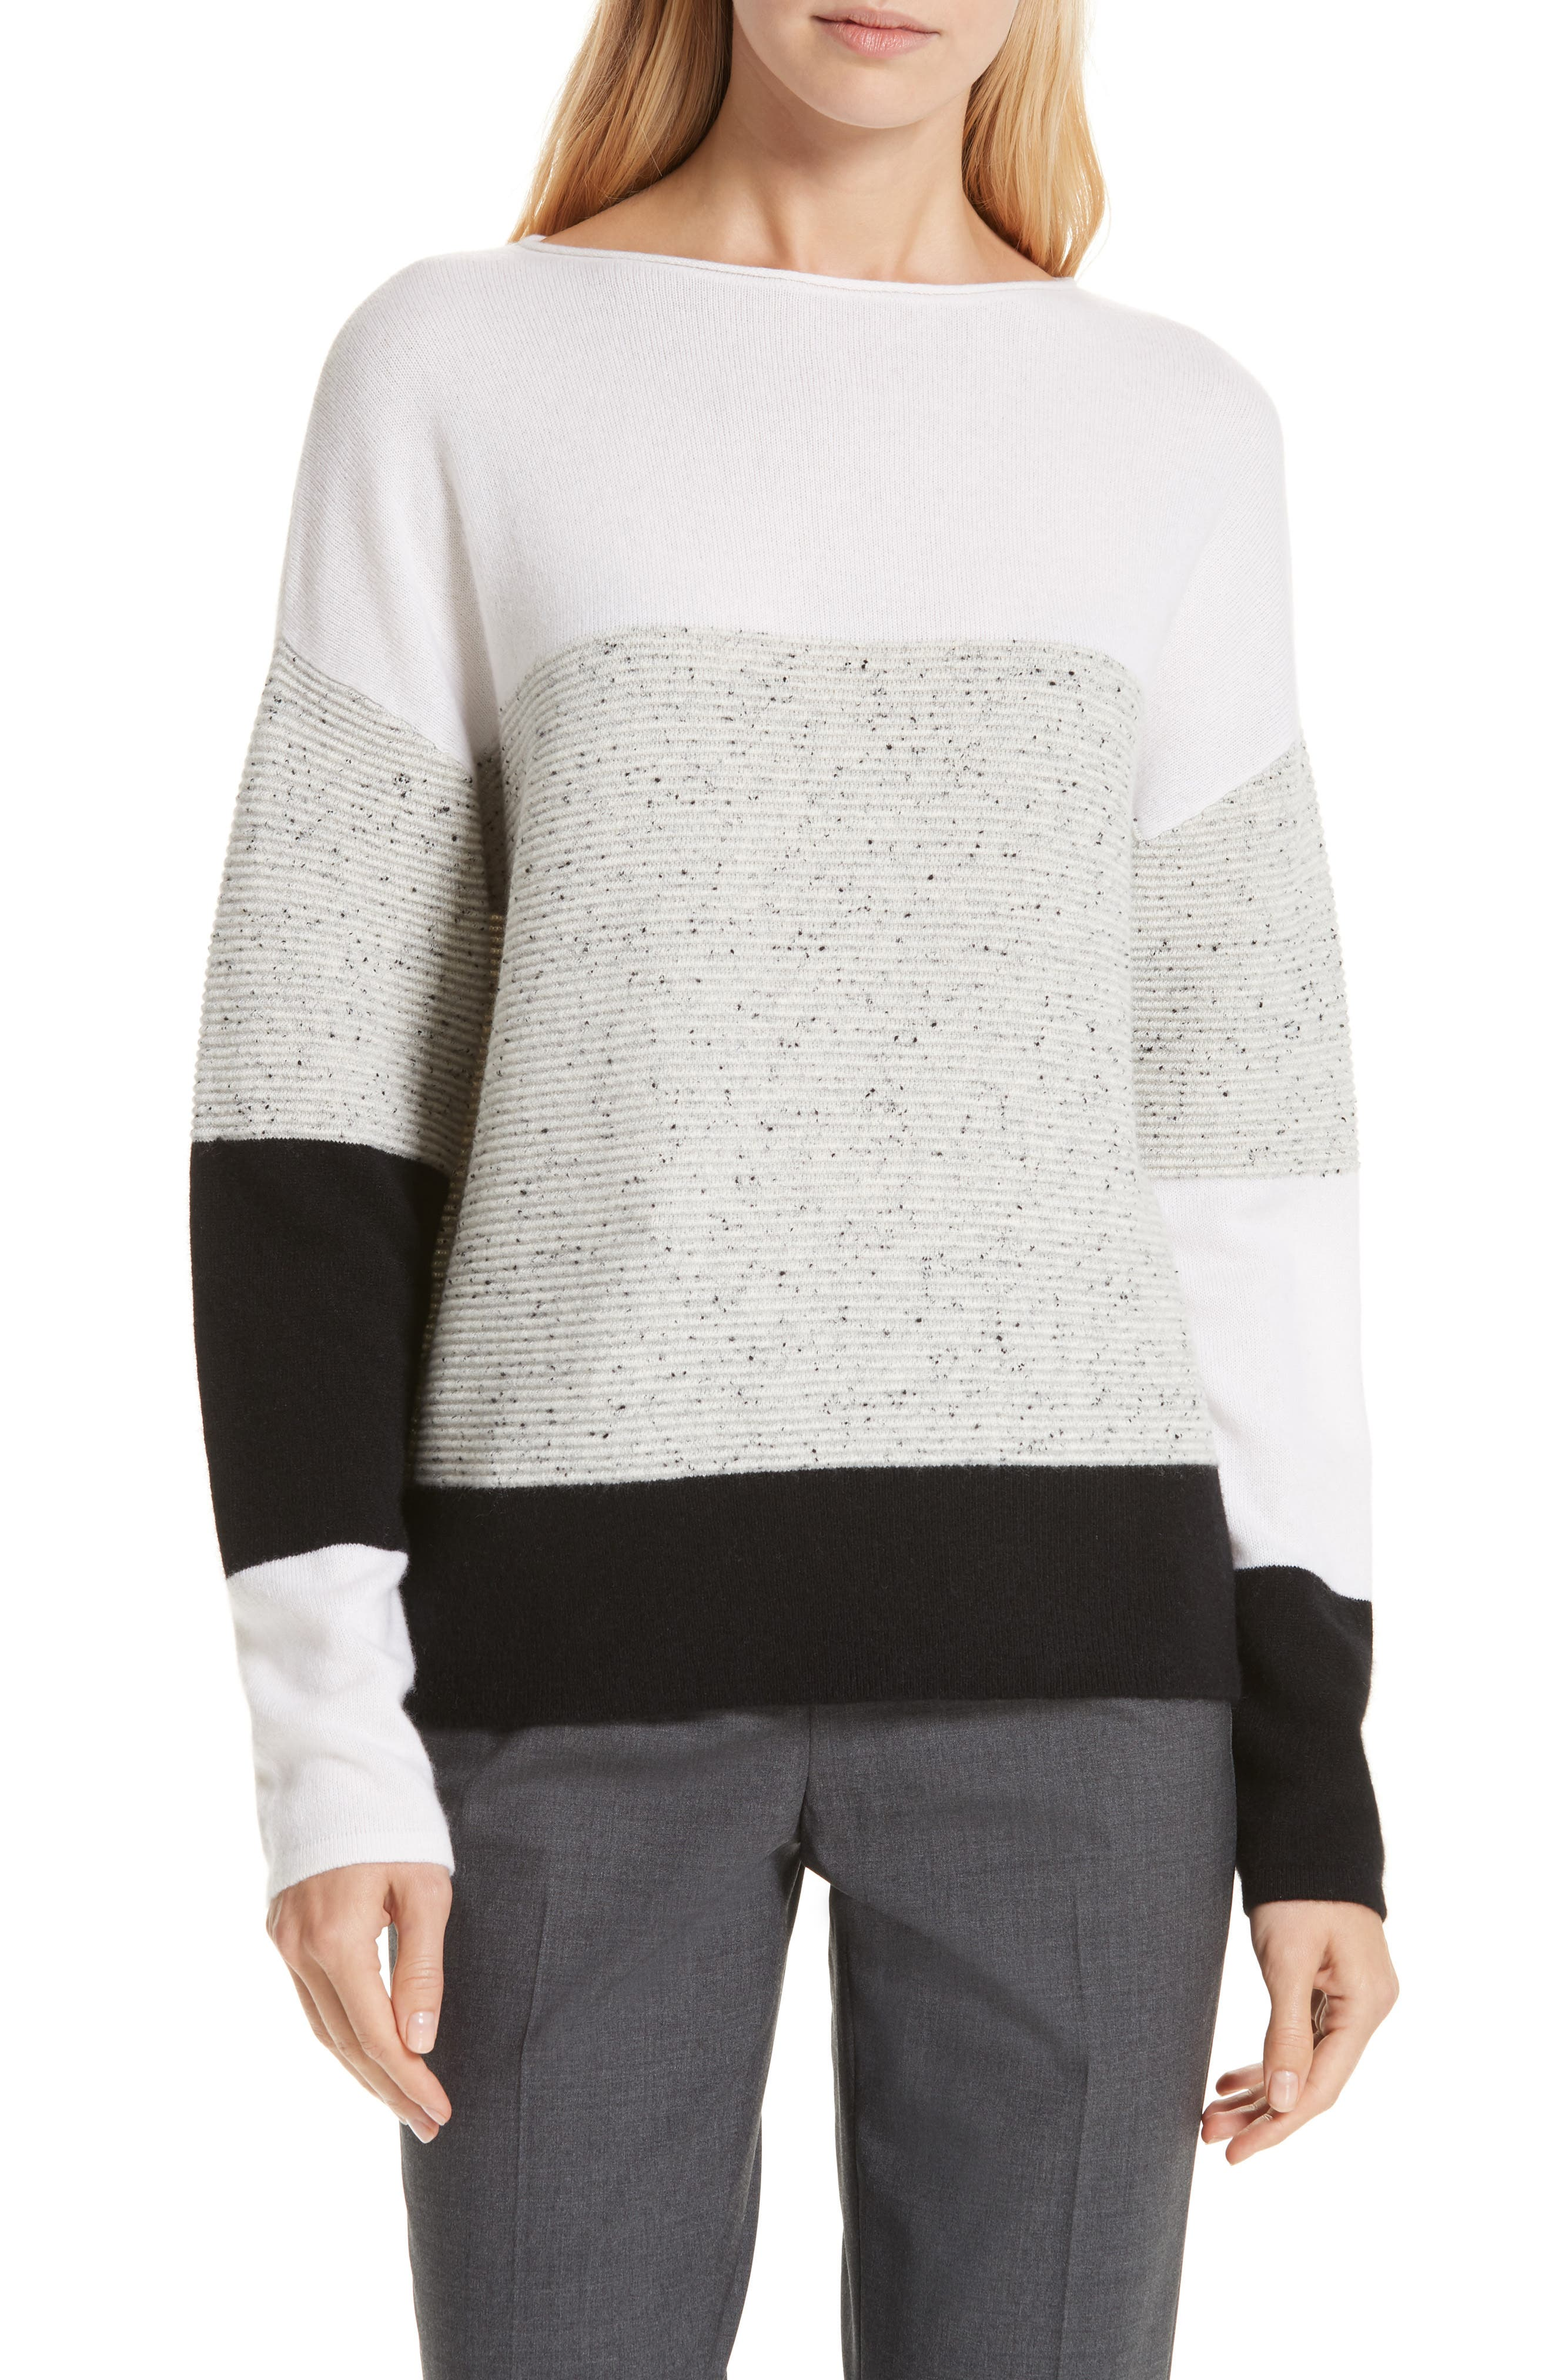 Colorblock Cashmere Sweater,                             Main thumbnail 1, color,                             IVORY SOFT MULTI COLOR BLOCK